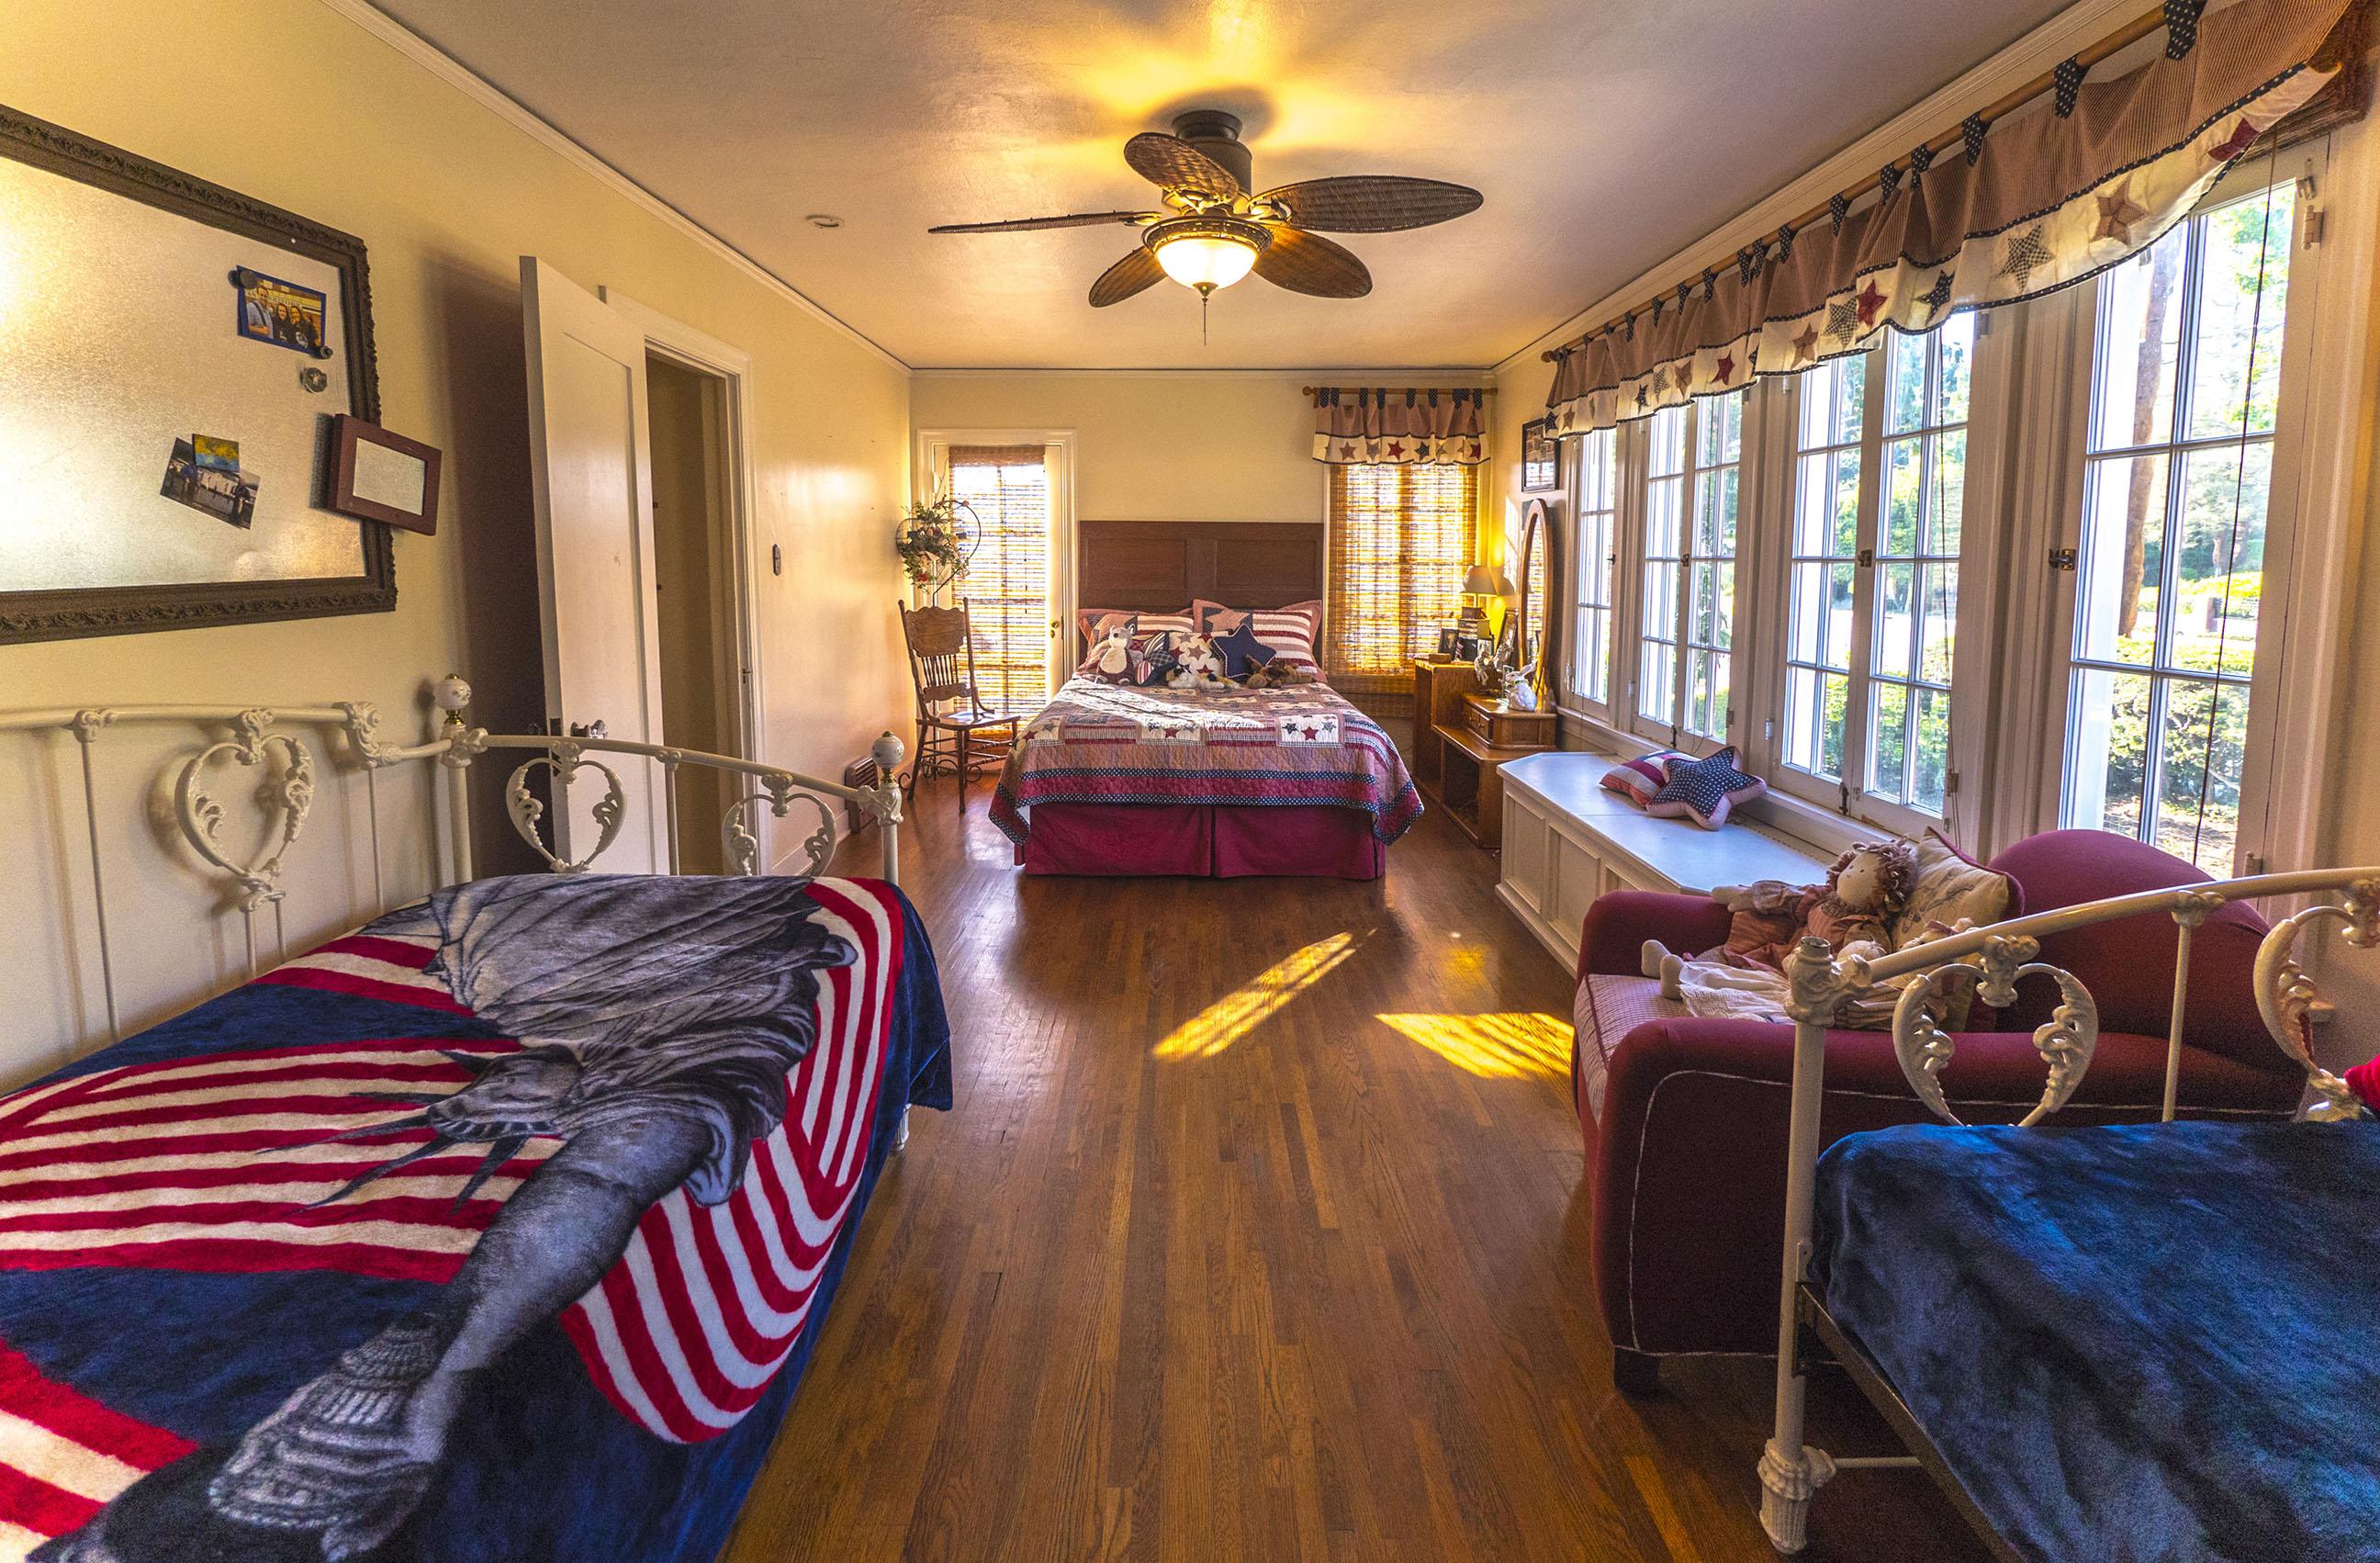 665 Sharp Boulevard - Bedroom B2 (small)